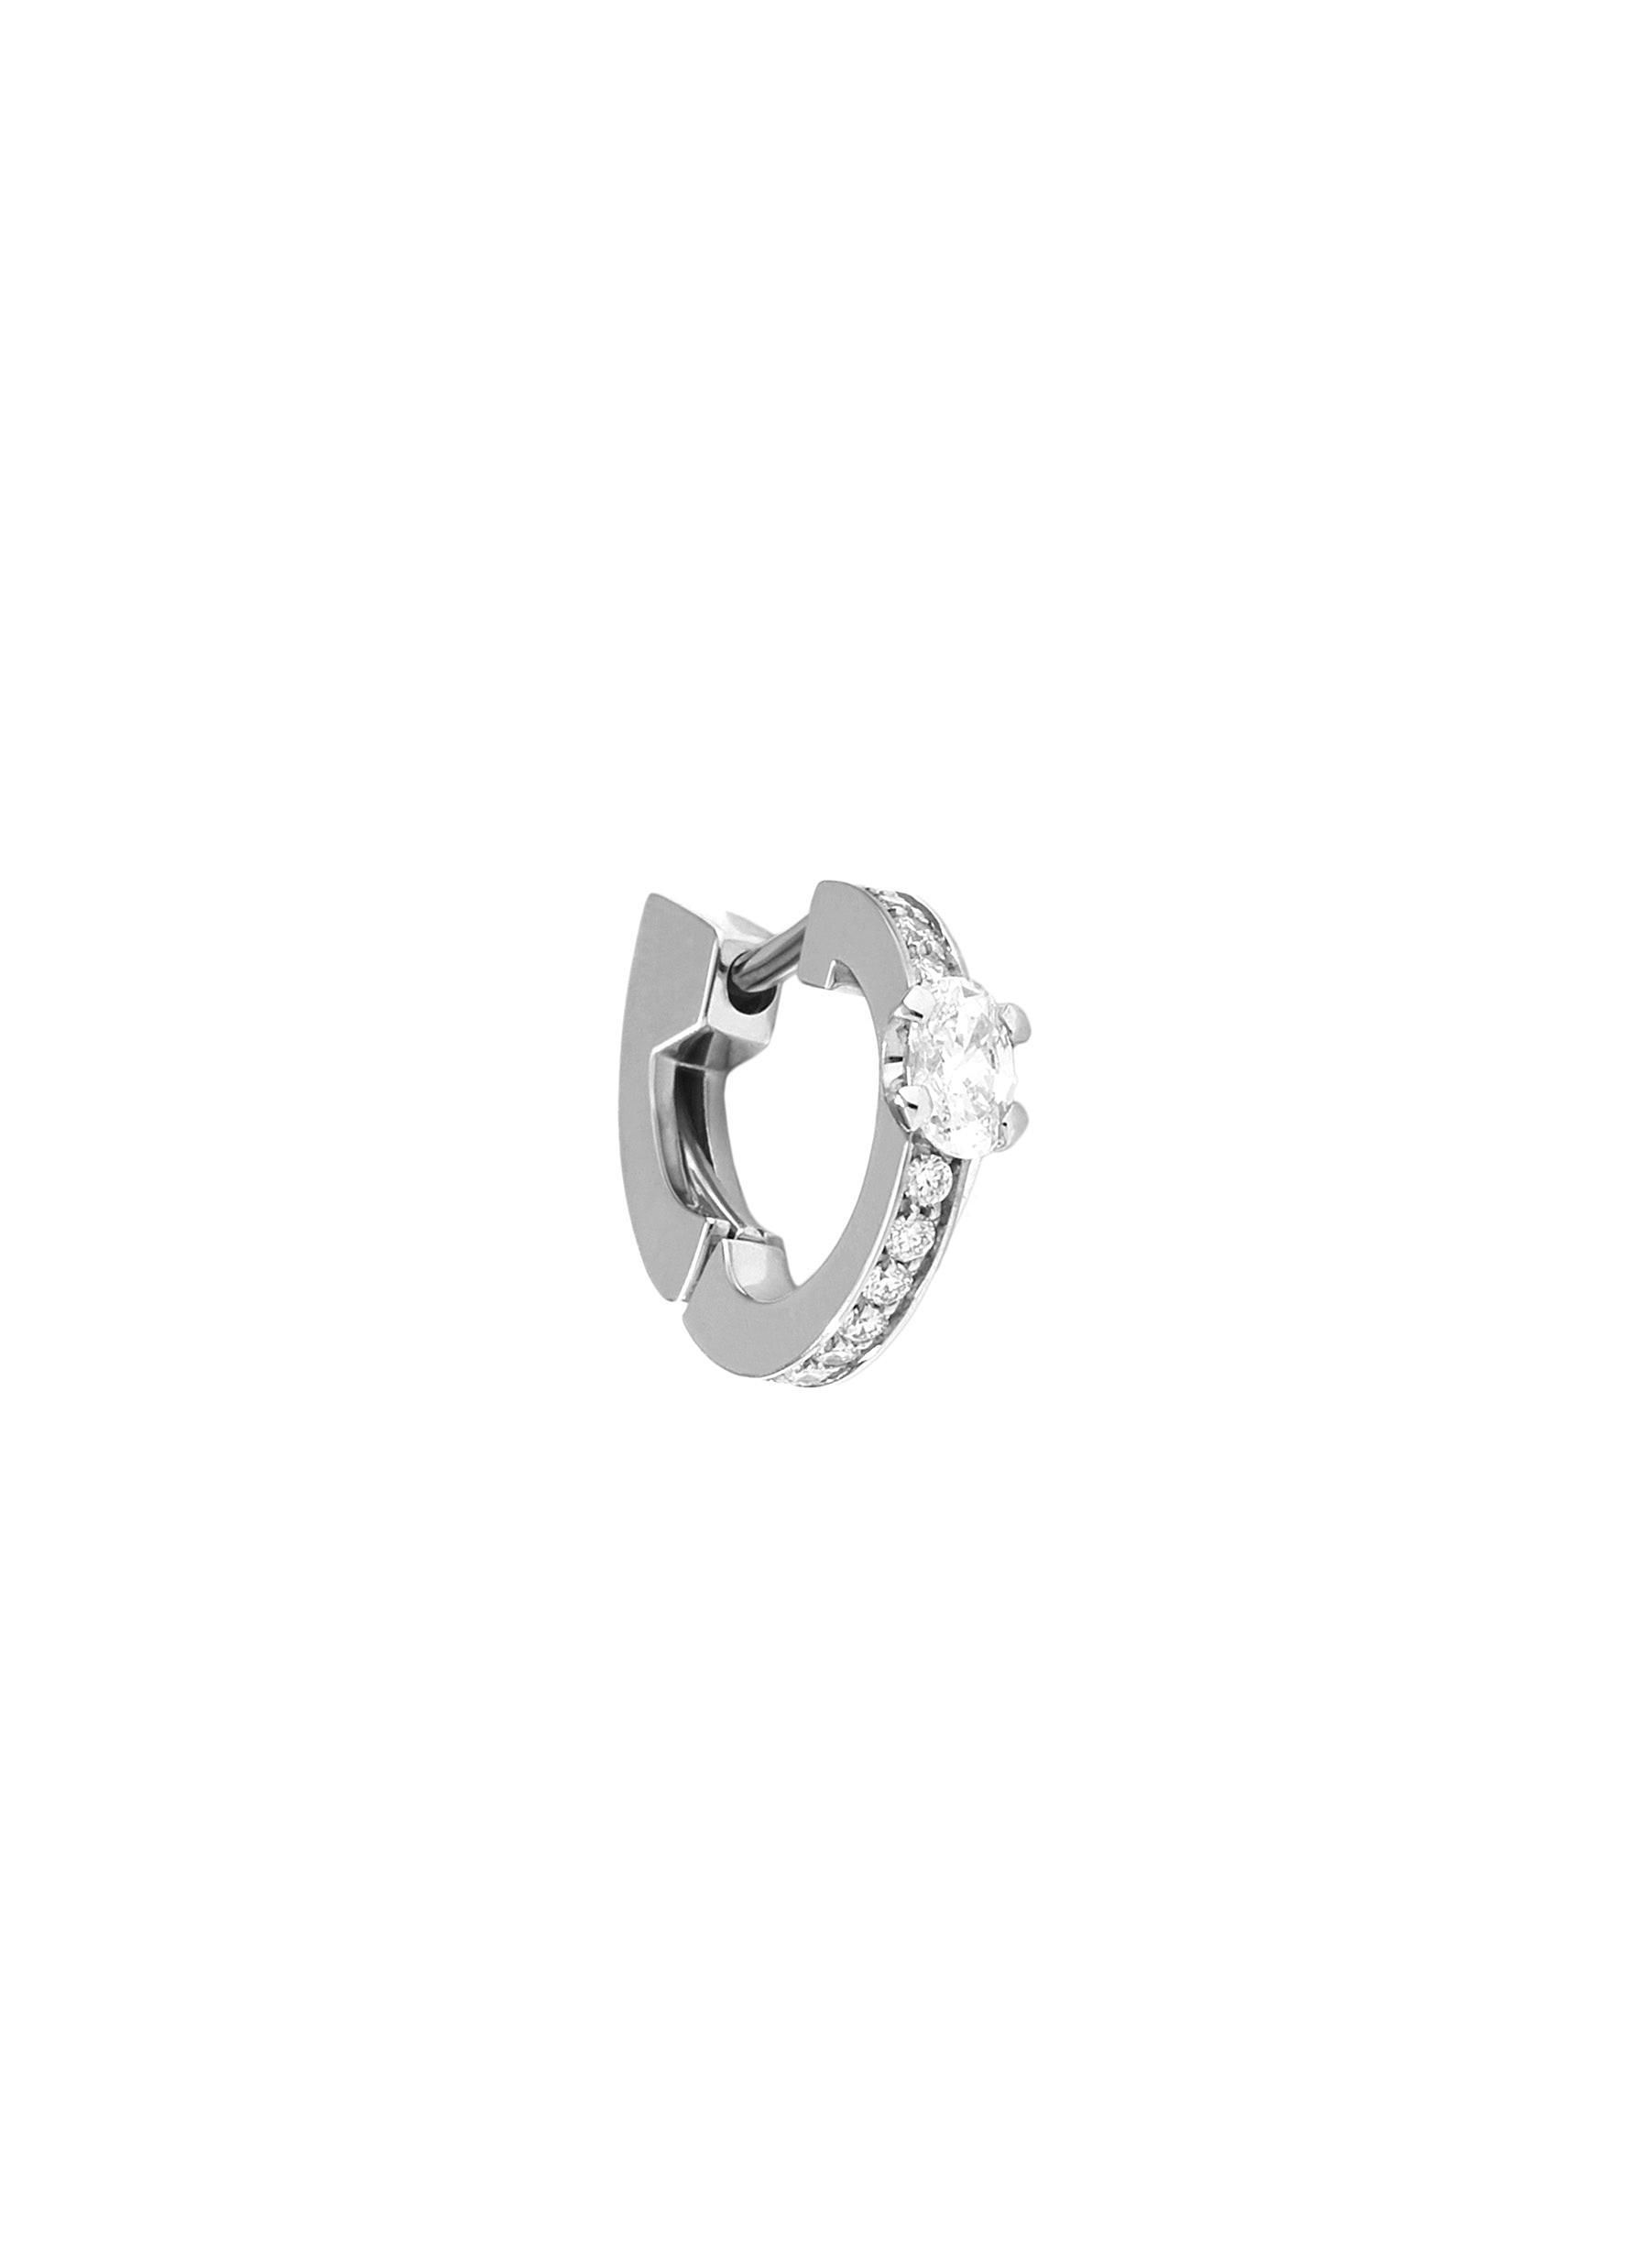 rak_38299_149800121 logo